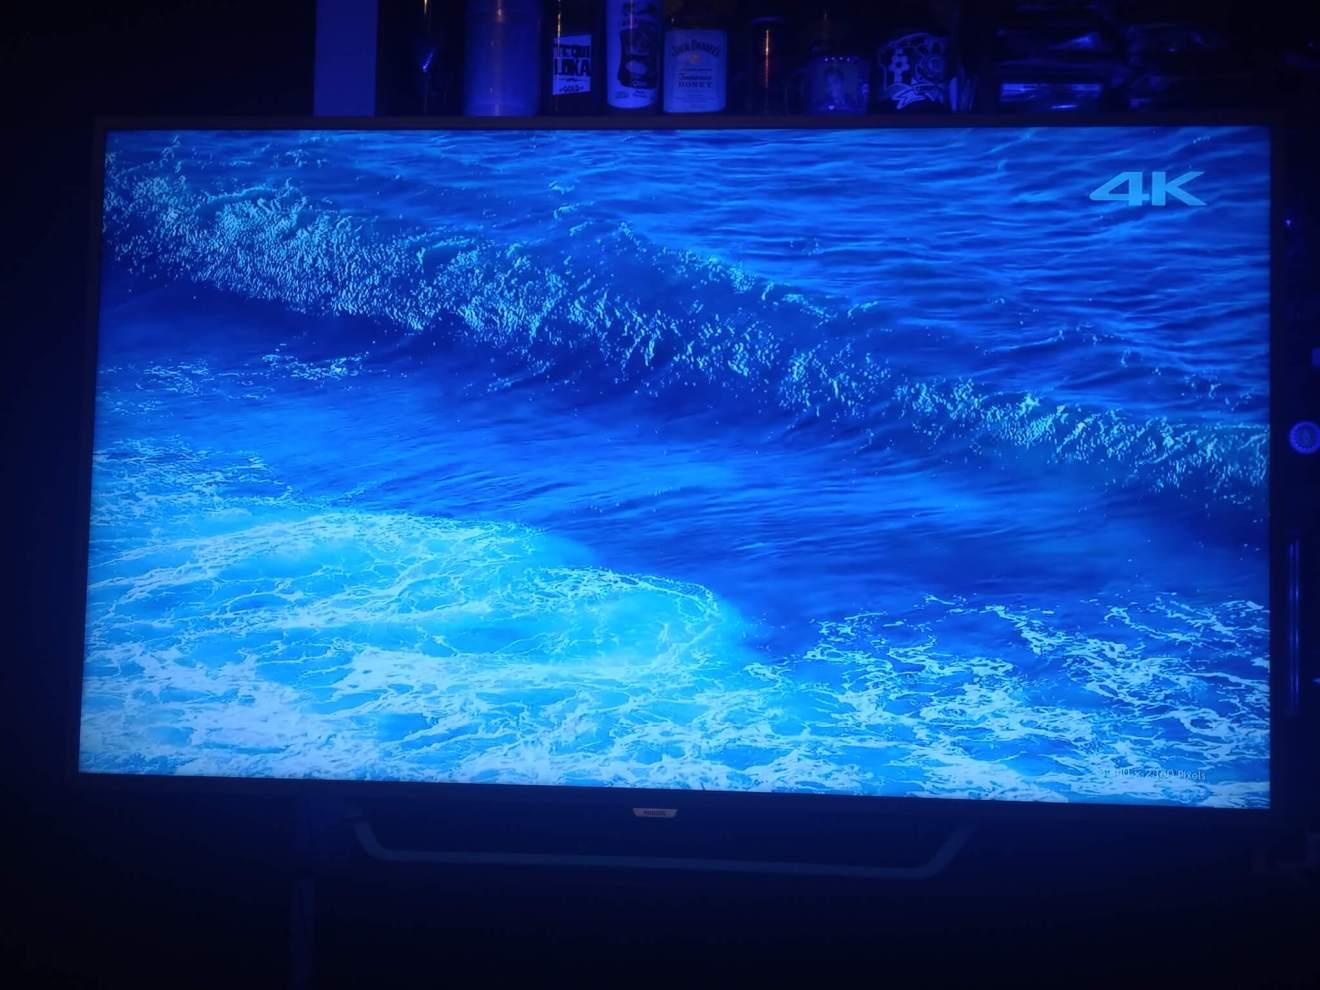 IMG 20180625 203331495 - Review: TV LED Ambilight Philips 65PUG6412/78 entrega experiência impressionante